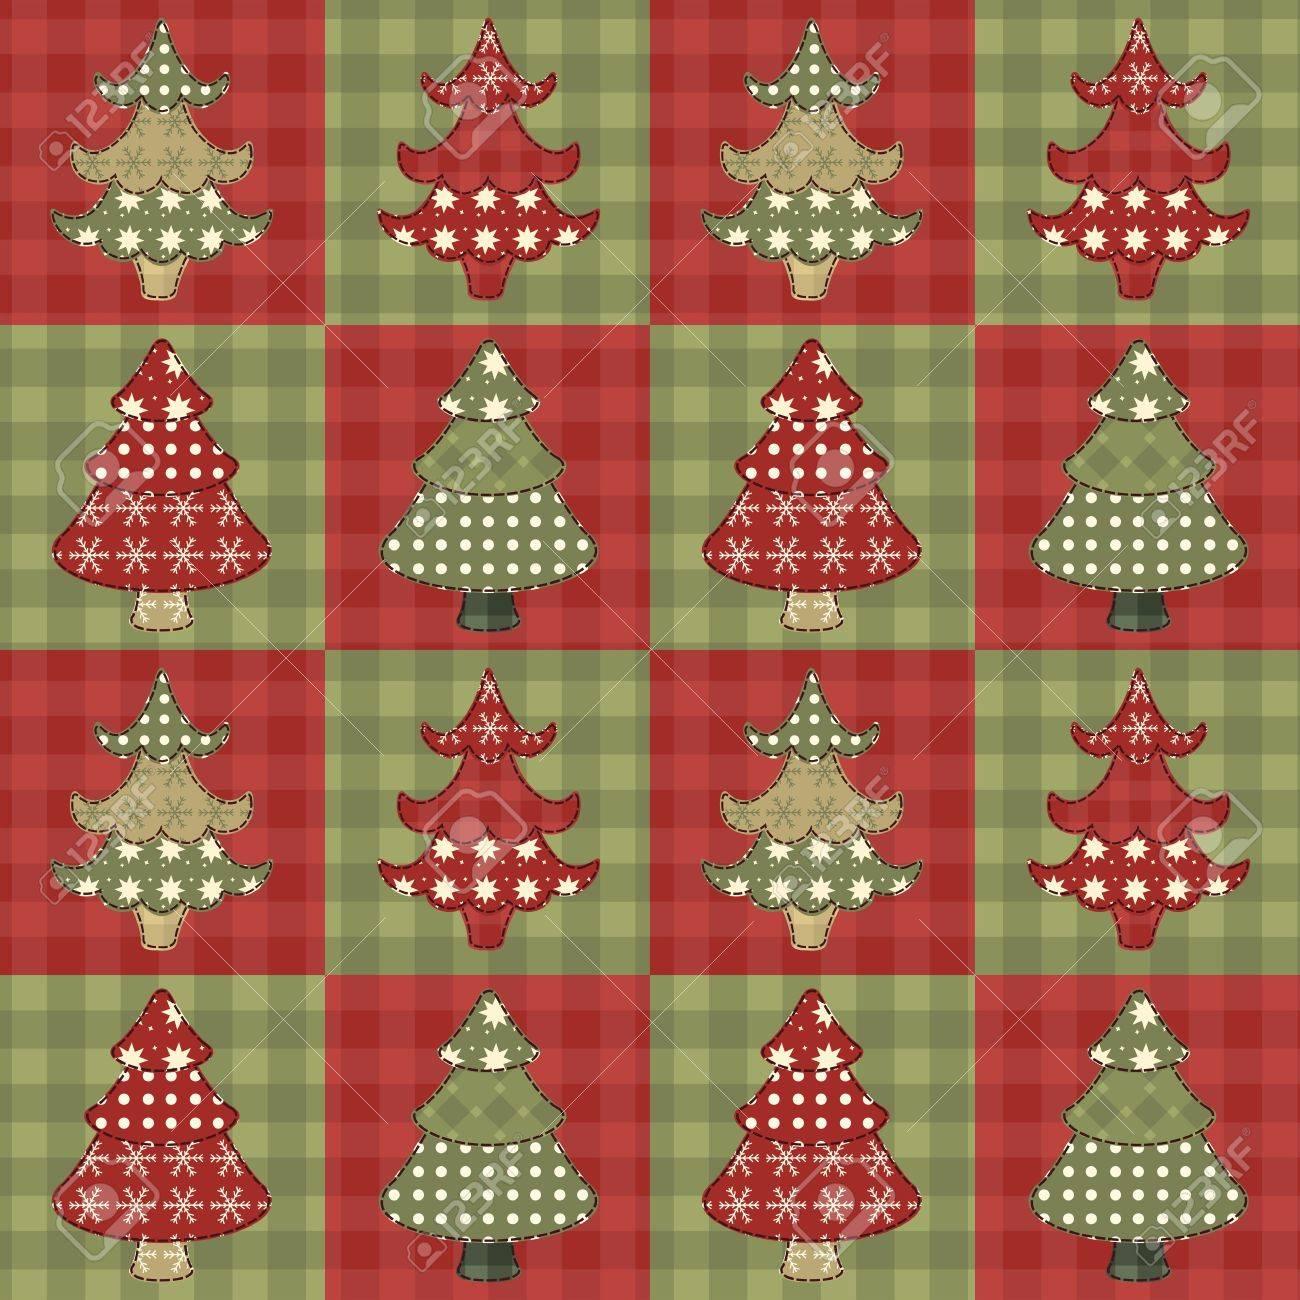 Christmas tree  seamless pattern 1 Stock Vector - 16539670